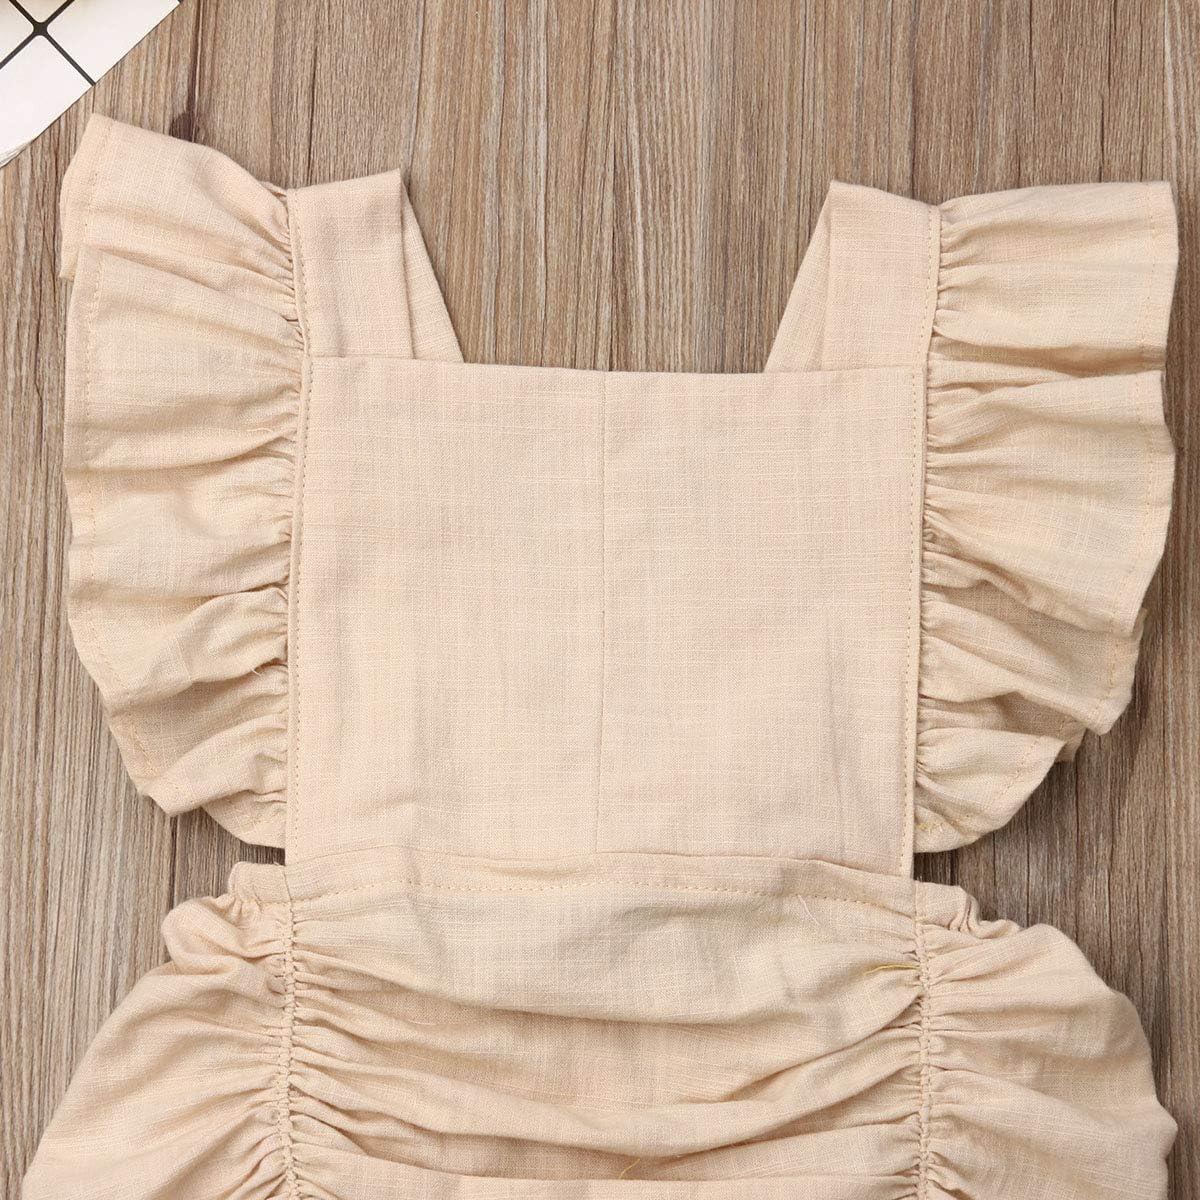 Newborn Shower Clothes Straps Cross Bodysuit One Piece Sleepwear FAROOT Muslin Baby Romper Outfit Bubble Playsuit Suit